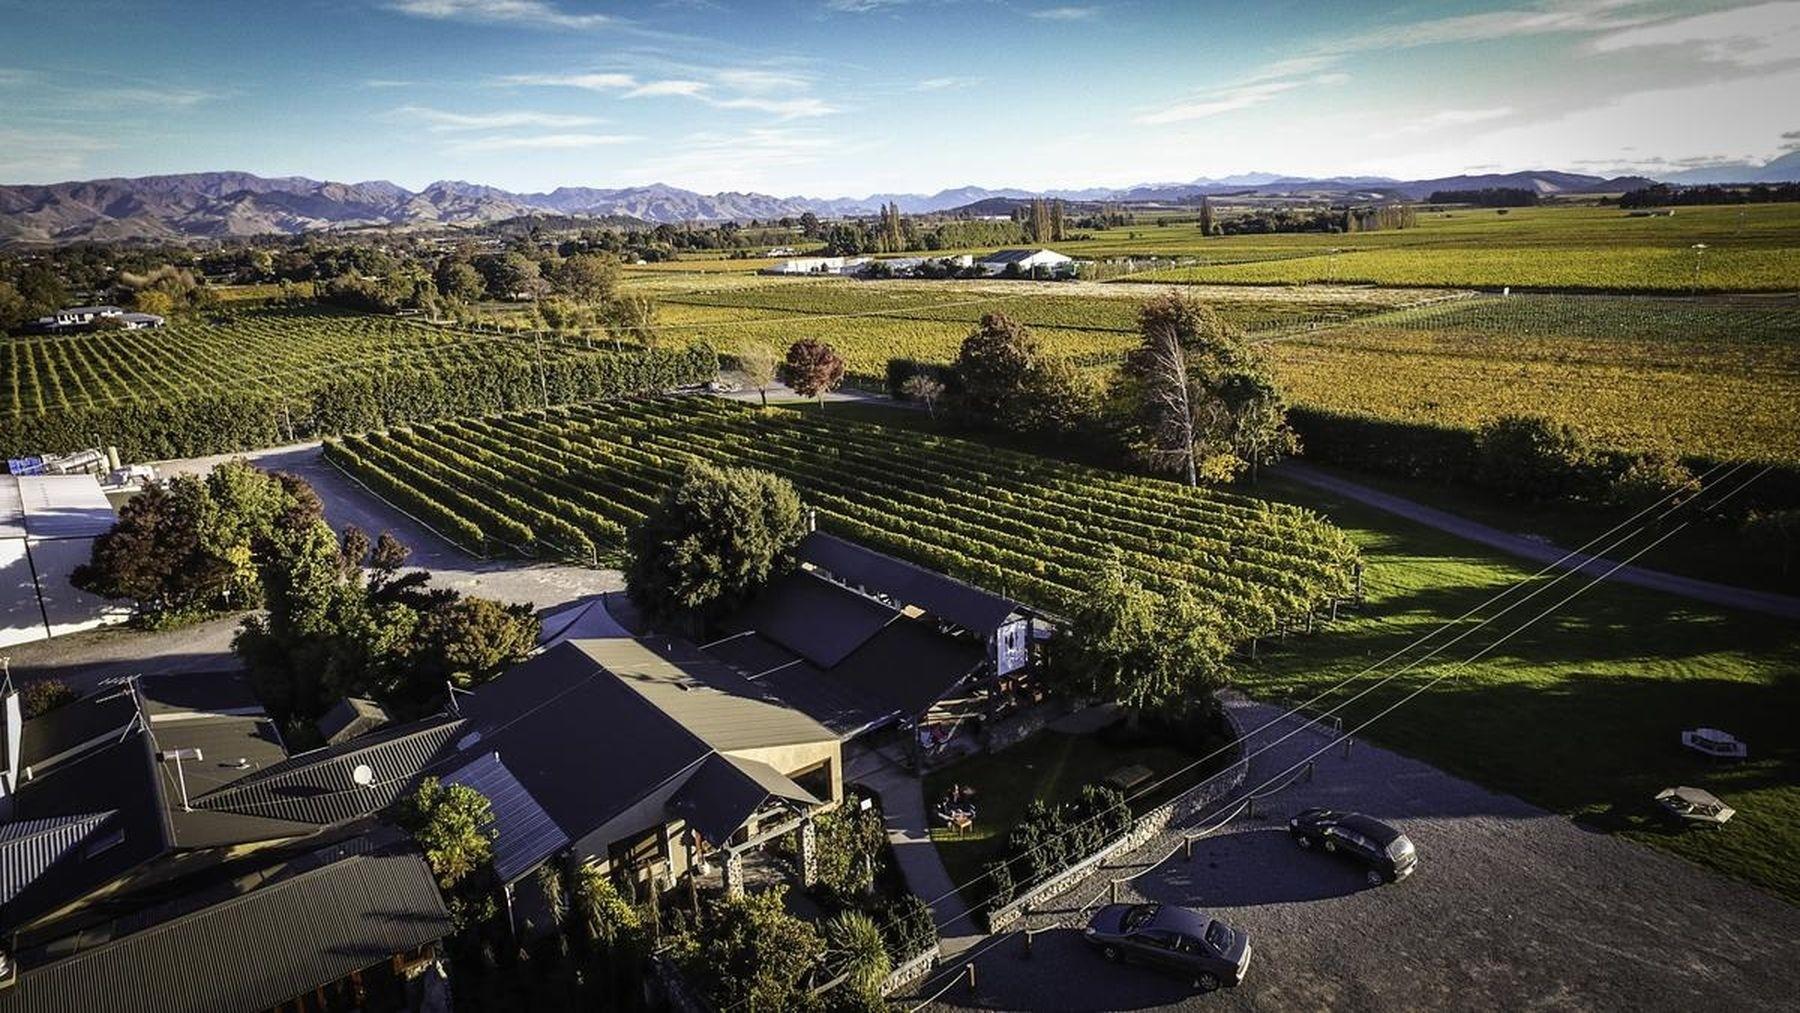 Forrest - Marlborough - Nueva Zelanda - 2020